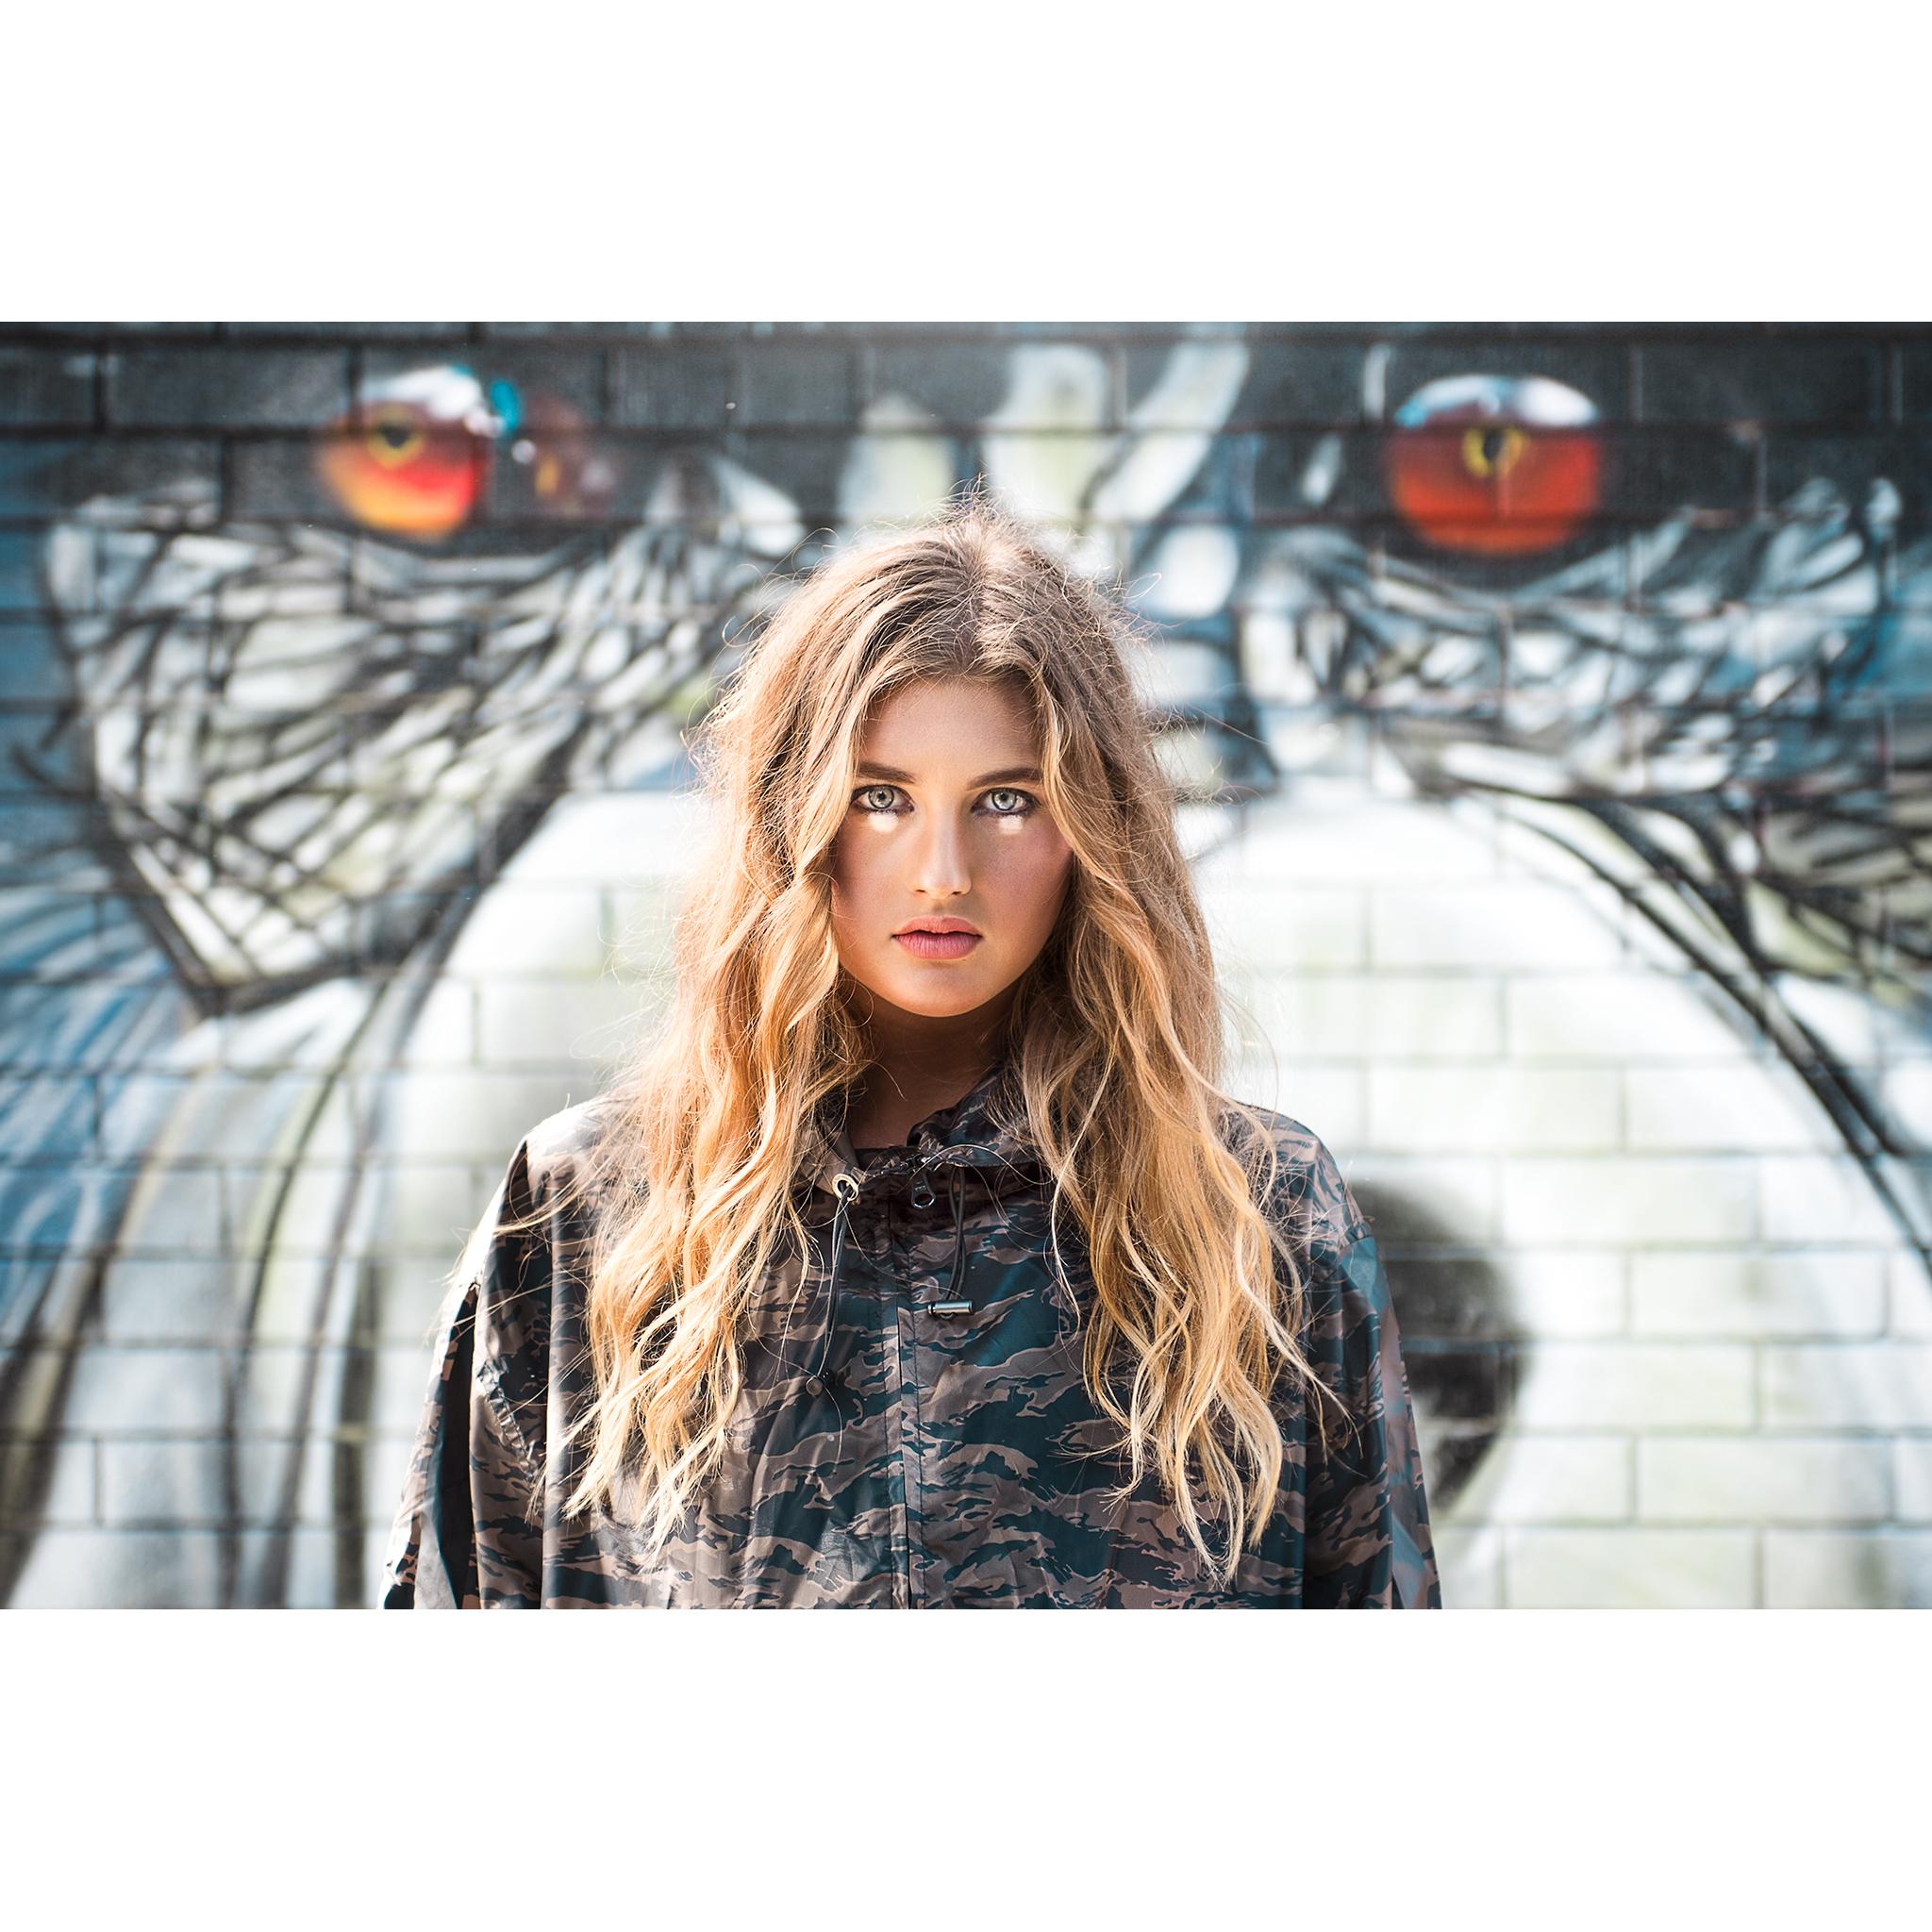 Hannah-Grierson-w-Gorilla.jpg